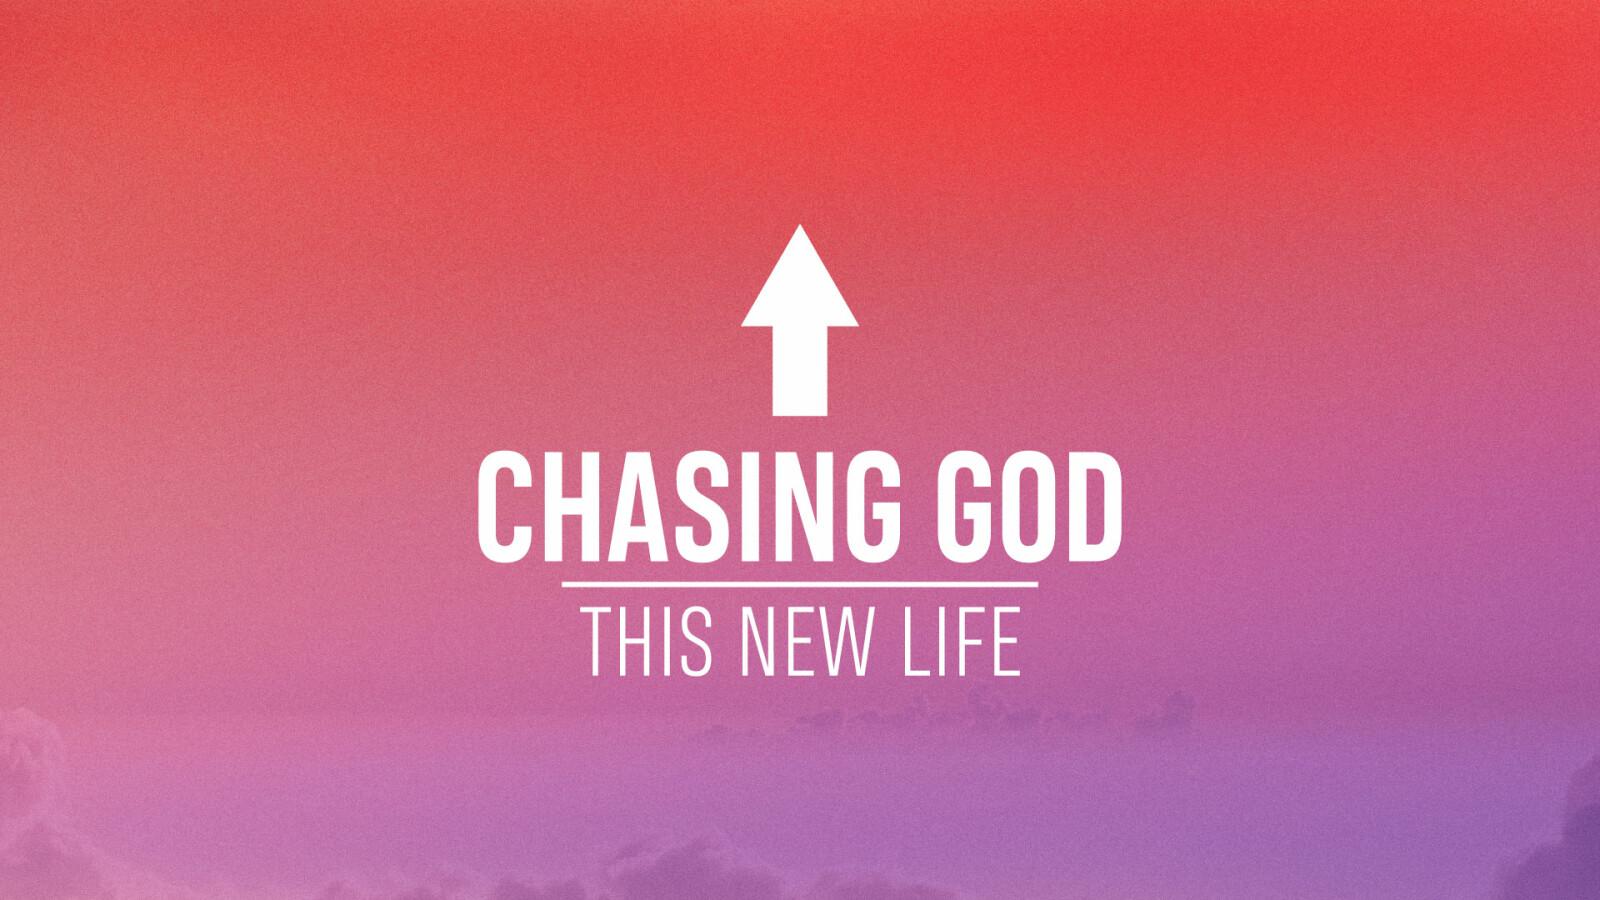 Chasing God 2021